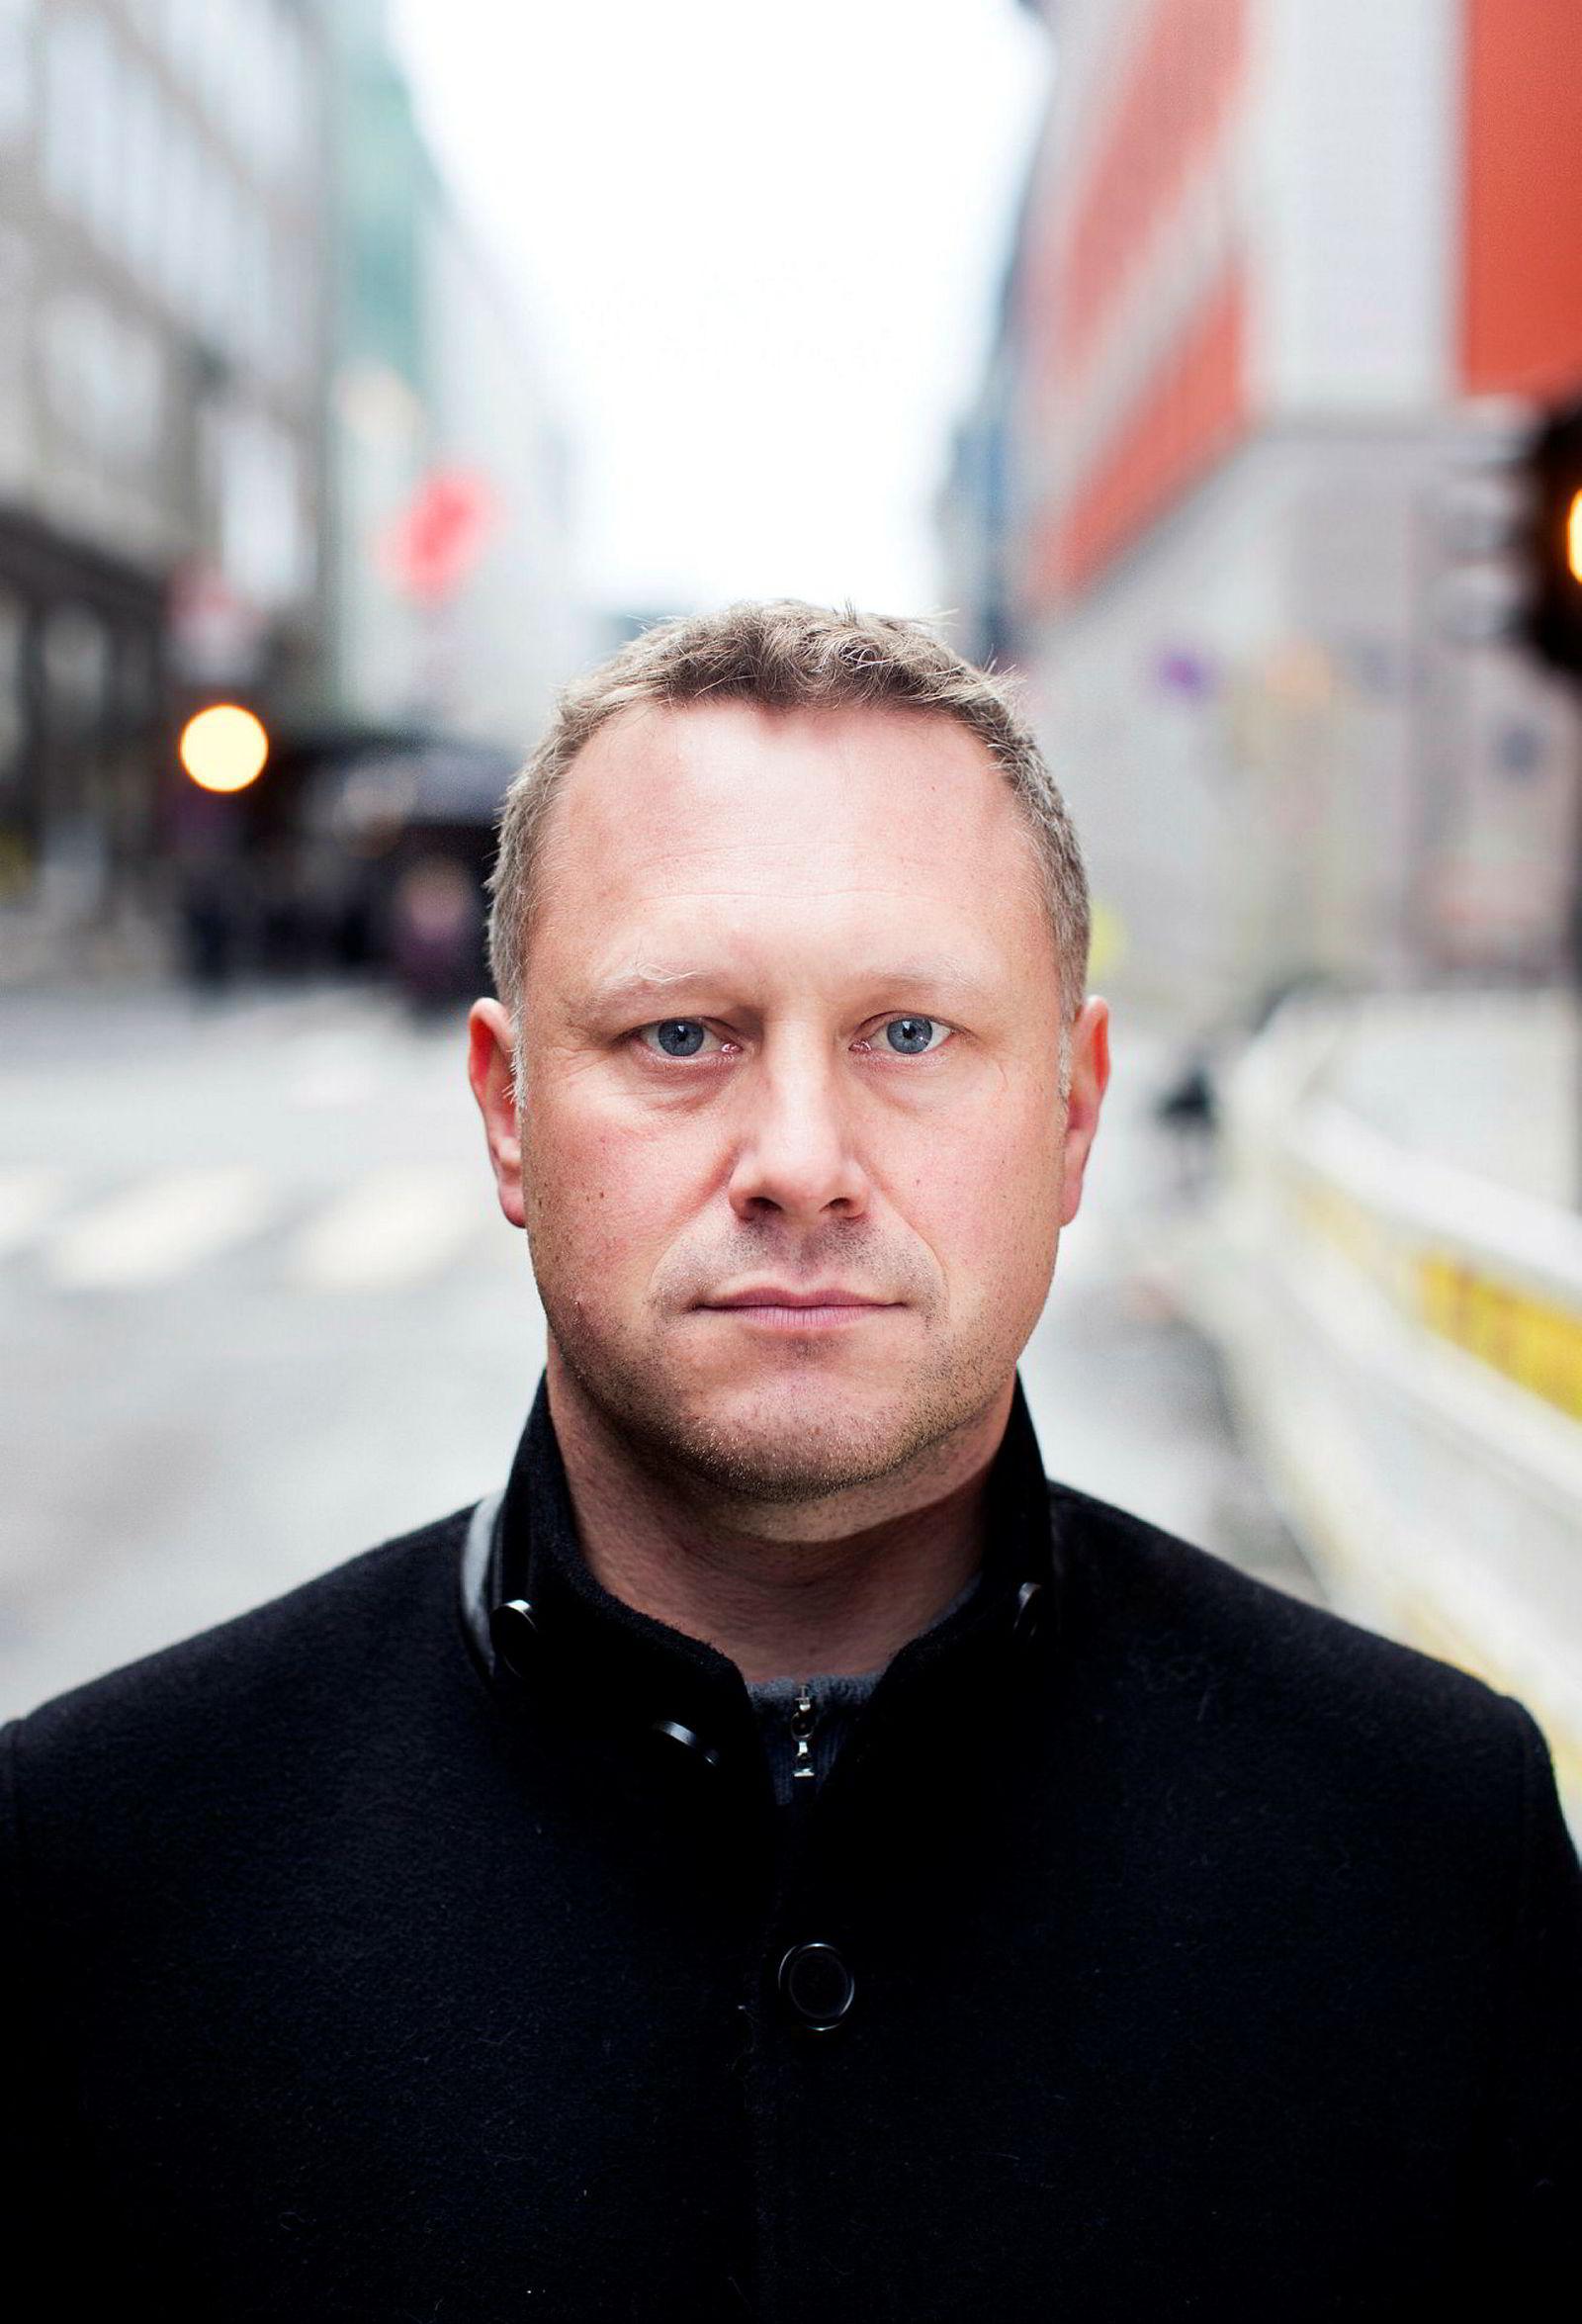 Administrerende direktør i Induct, Alf Martin Johansen.